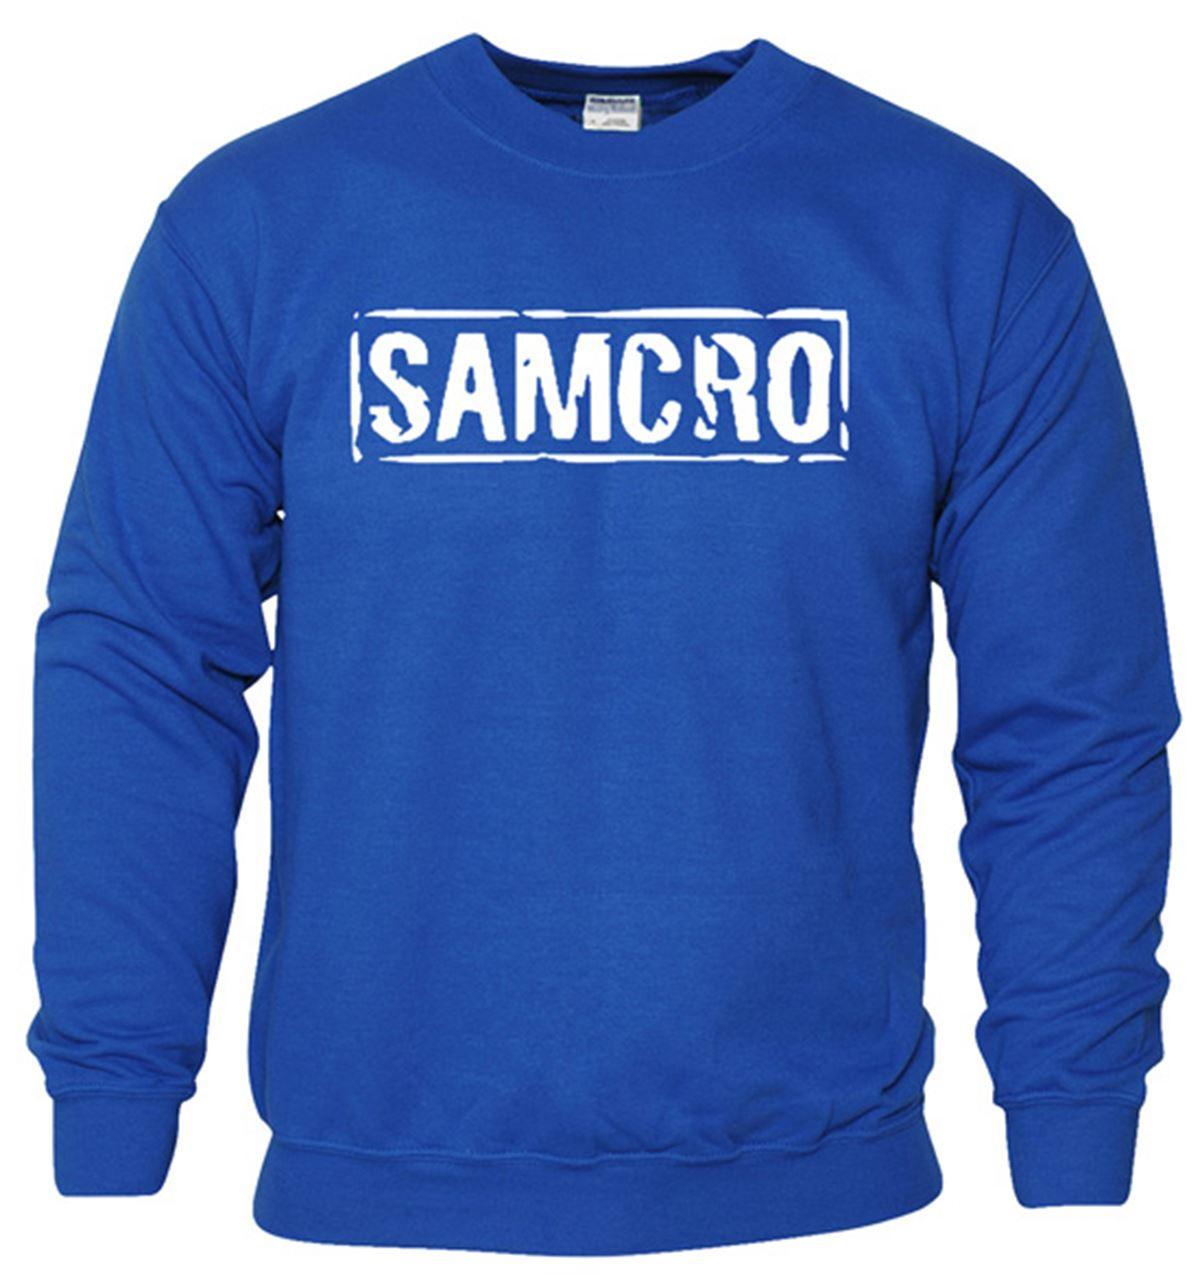 SAMCRO New Kids Sweat Classic Long Sleeve Pullover Gift jumper Top Sweatshirt